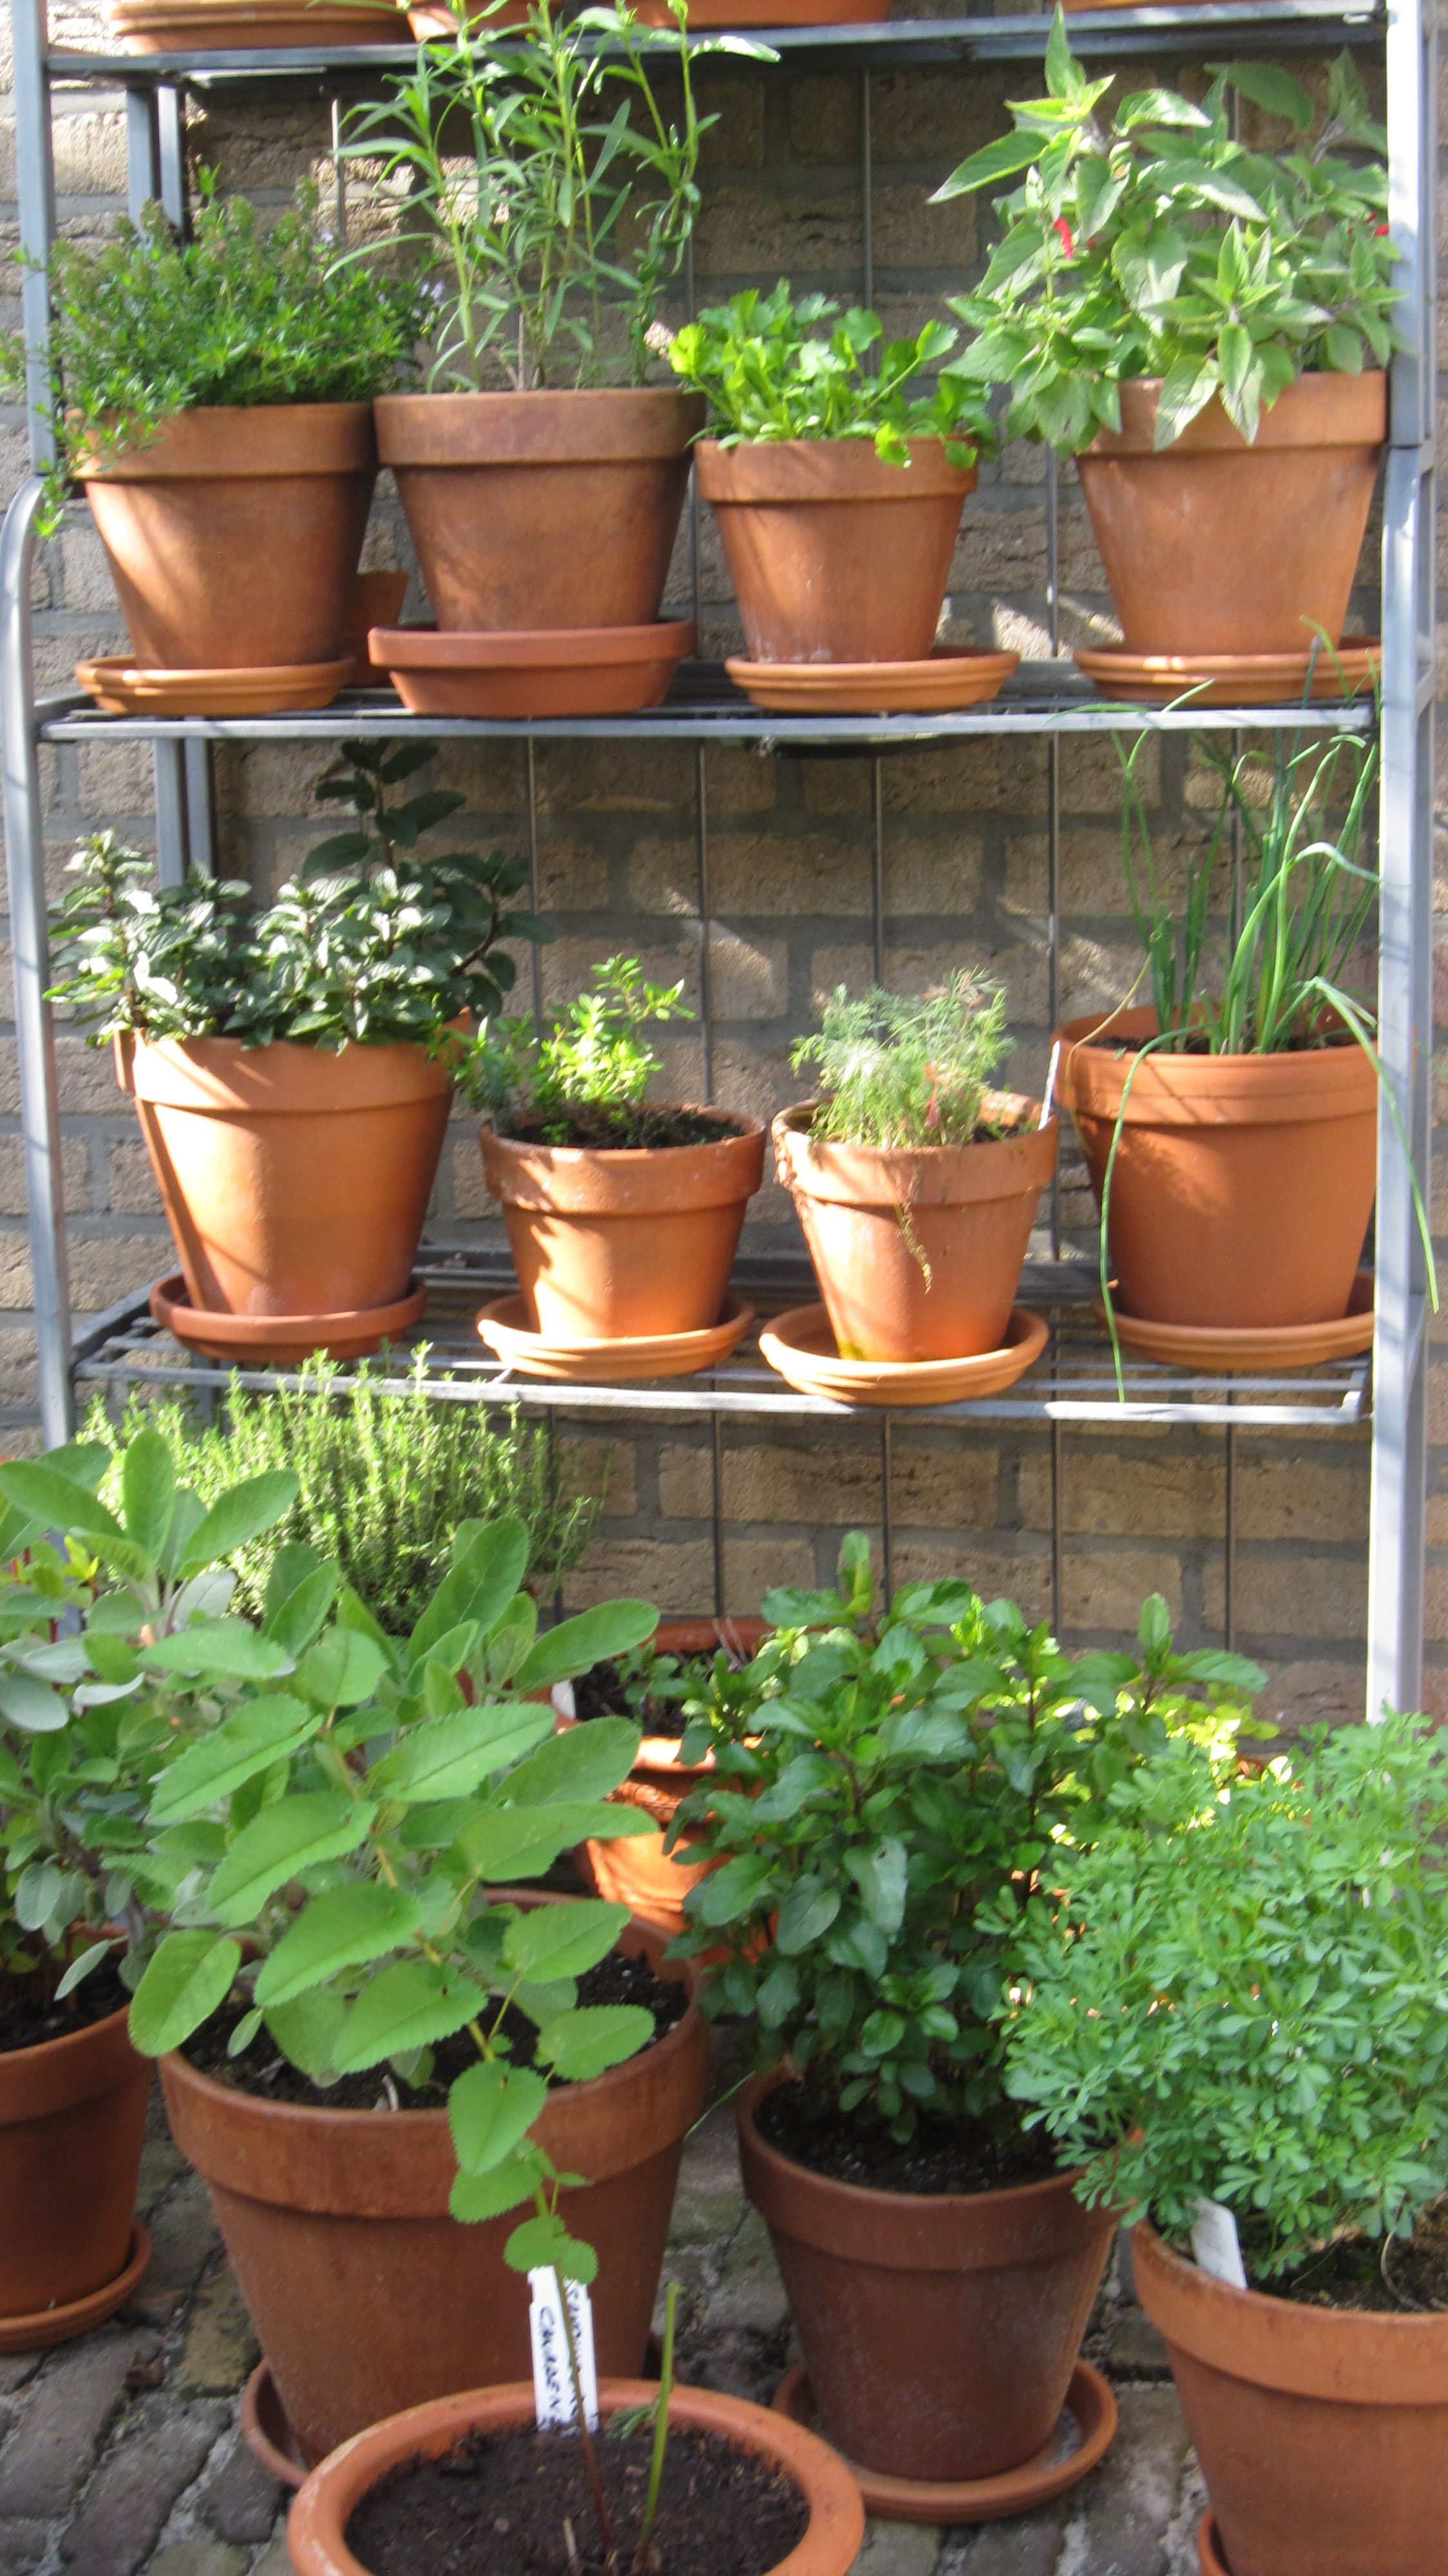 Mini Laghetto Per Terrazzo mijn kruidenrek (met afbeeldingen) | tuin ideeën, tuin, groen